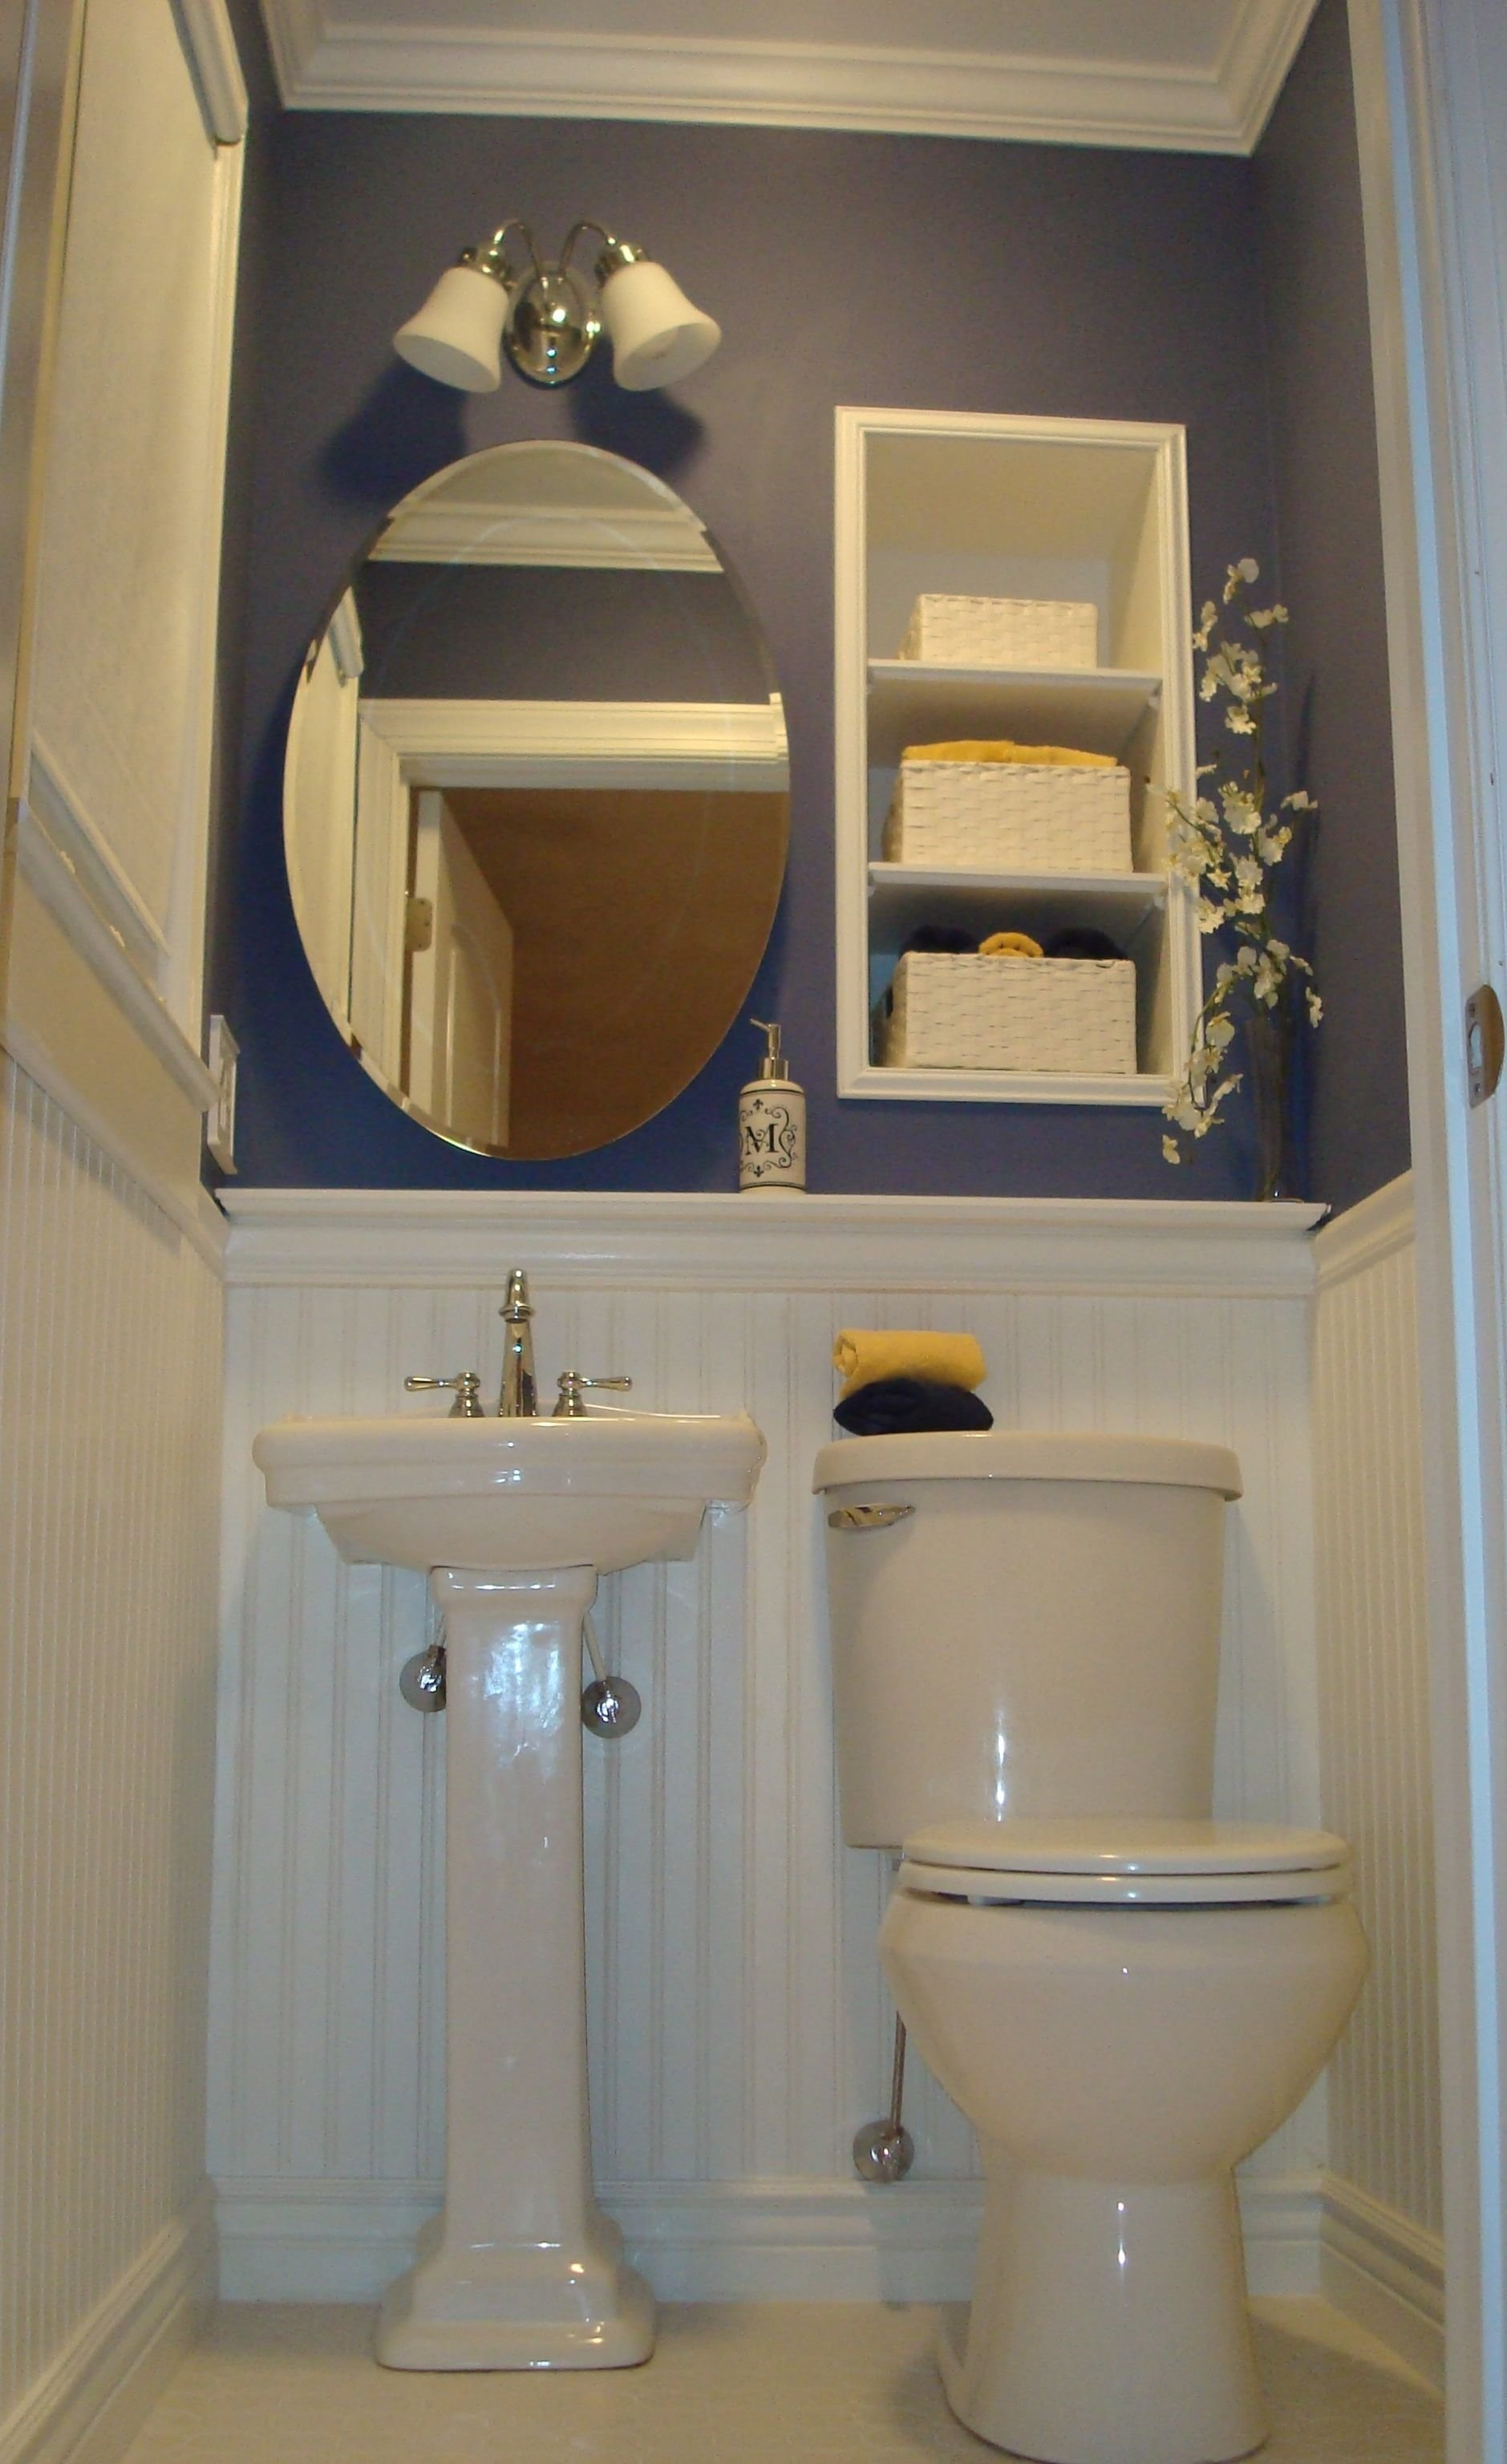 10 Cute Very Small Powder Room Ideas pallet wall in powder room designs powder room ideas designs 1